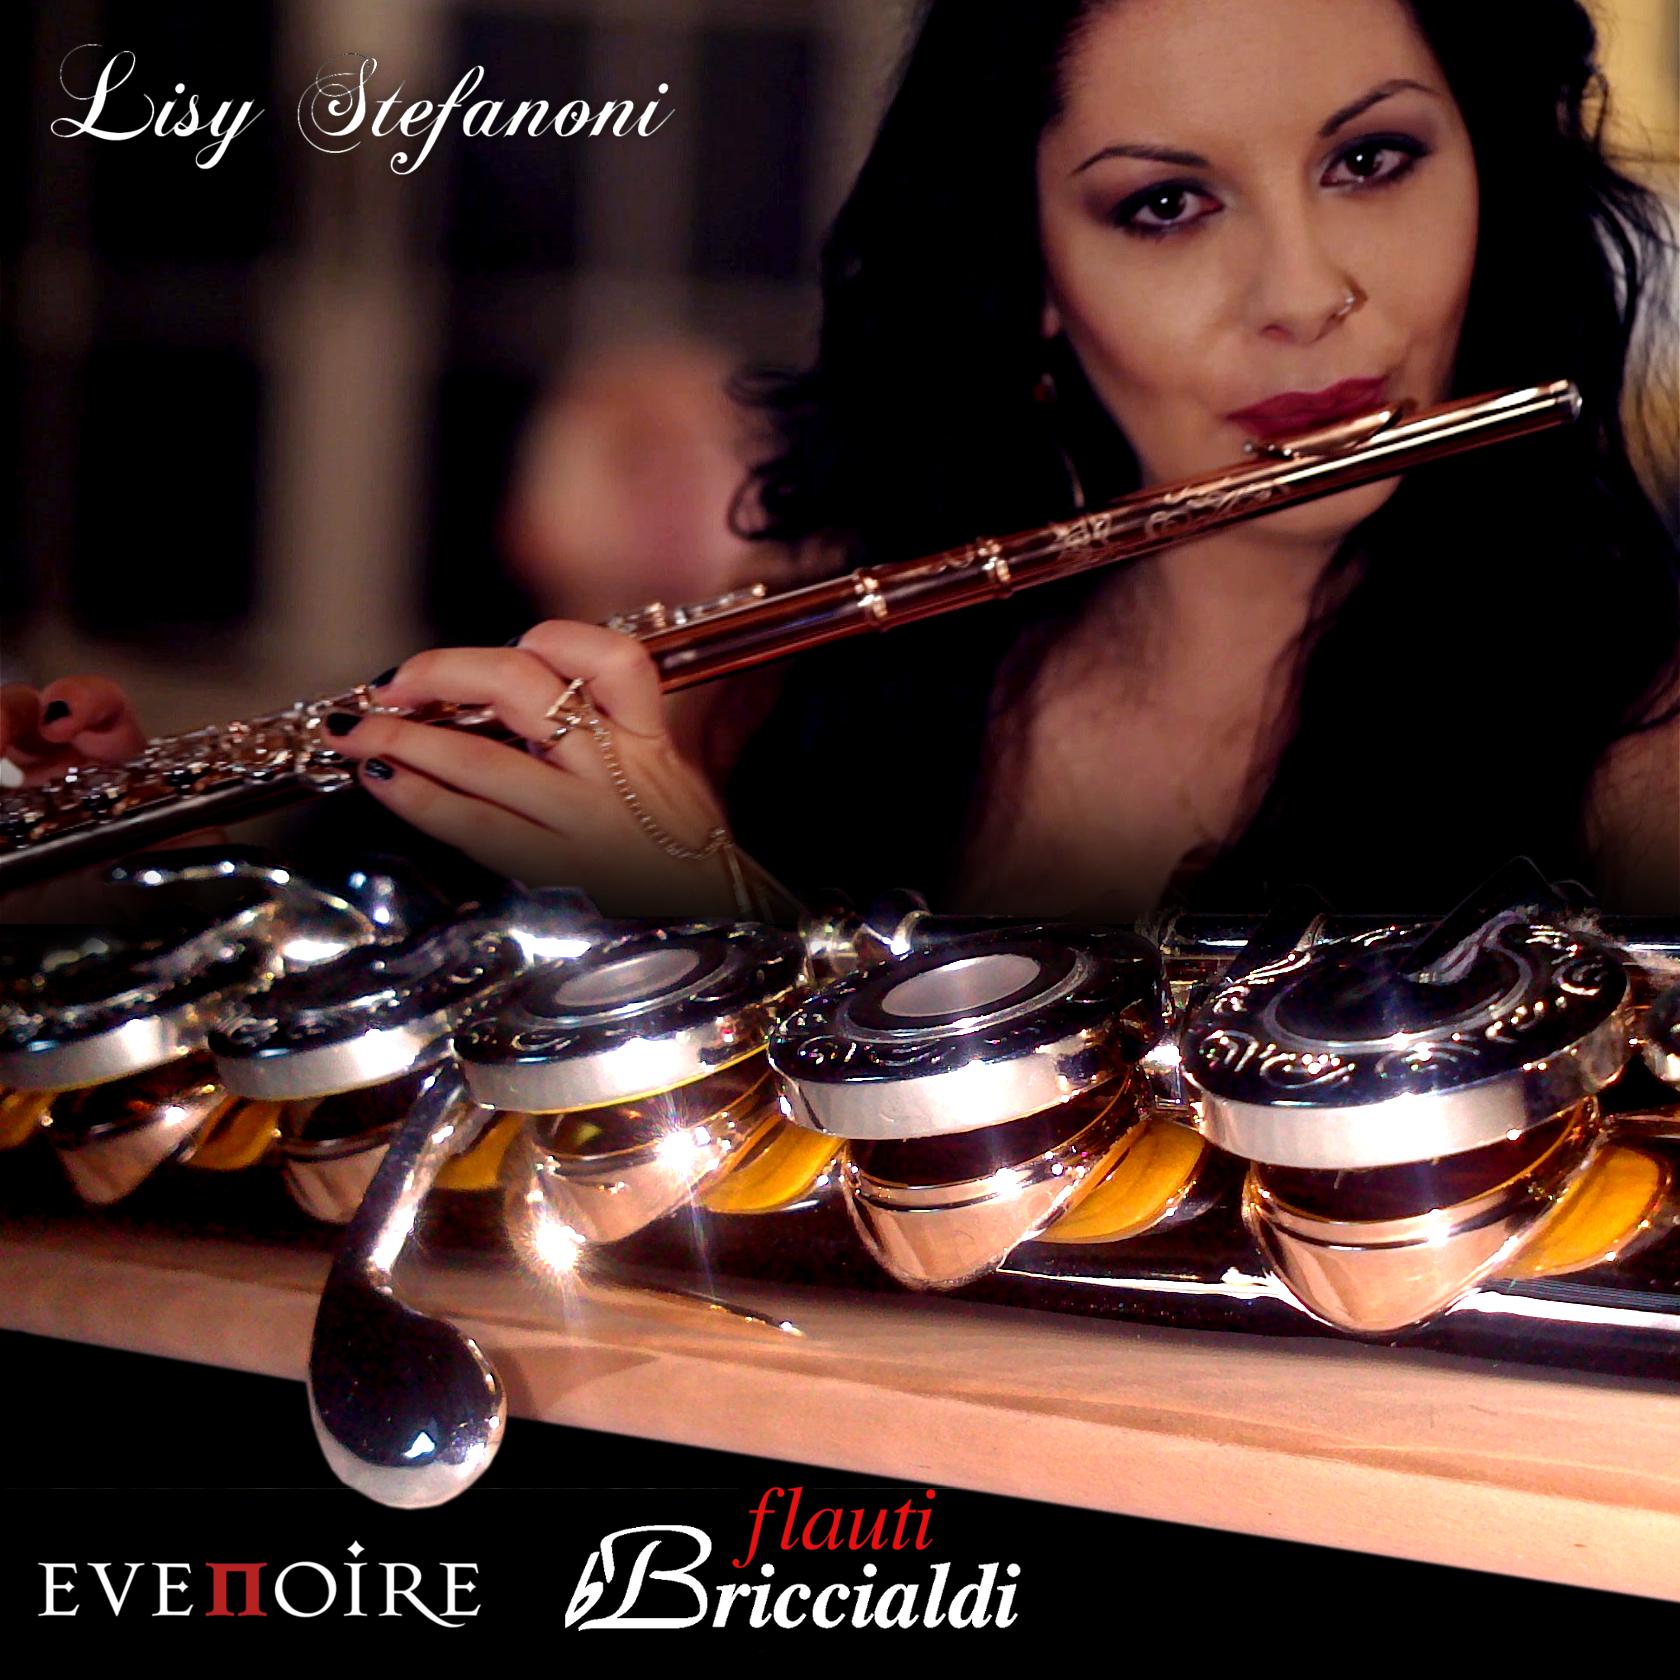 Lisy Stefanoni Flauto Traverso